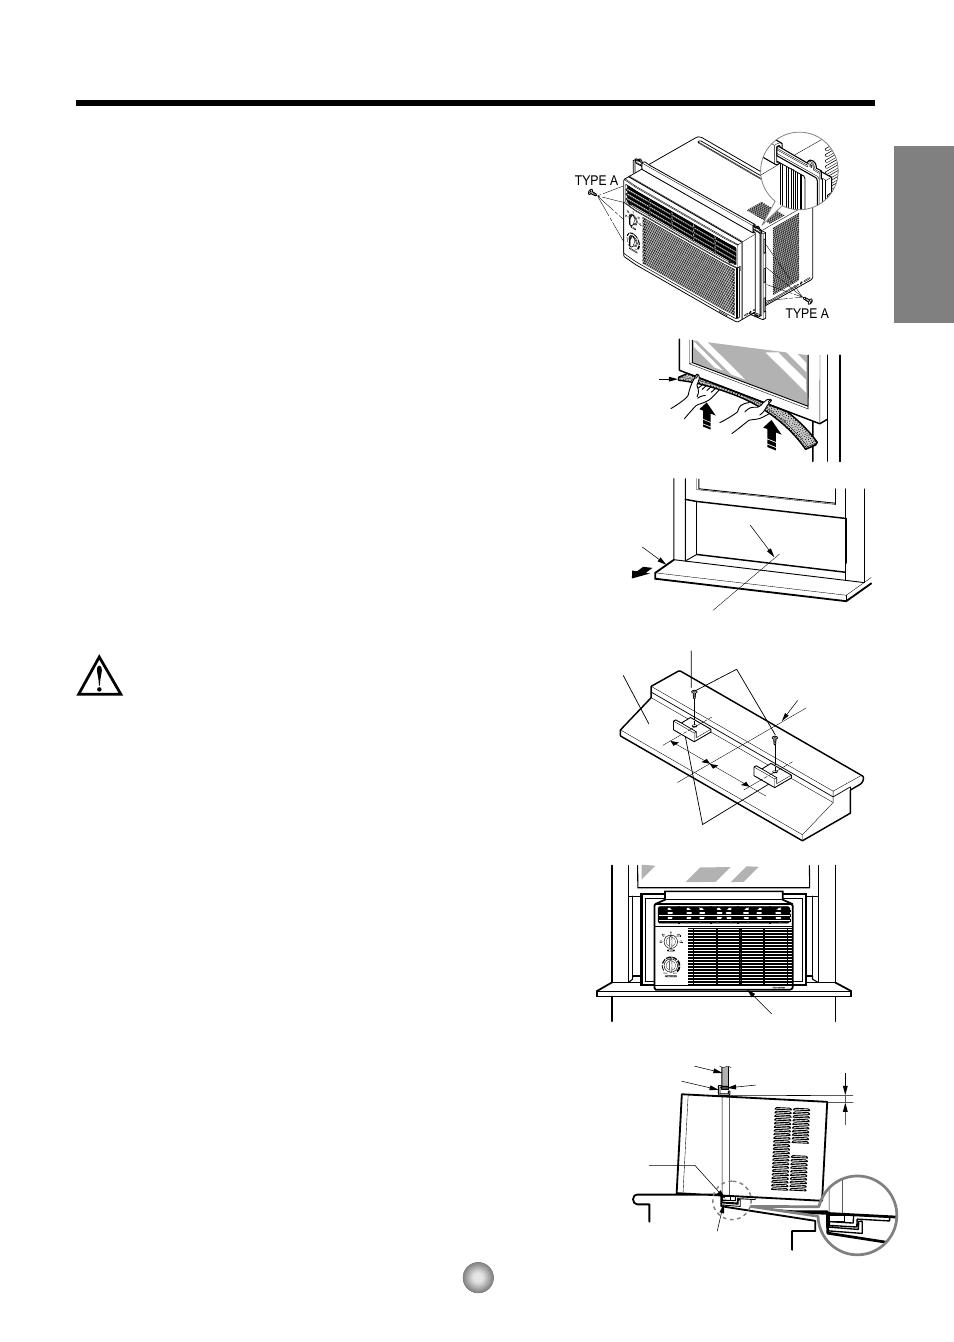 Friedrich Window Air Conditioner Manual Unit Wiring Diagram Installation Instructions English A Before B Begin Caution